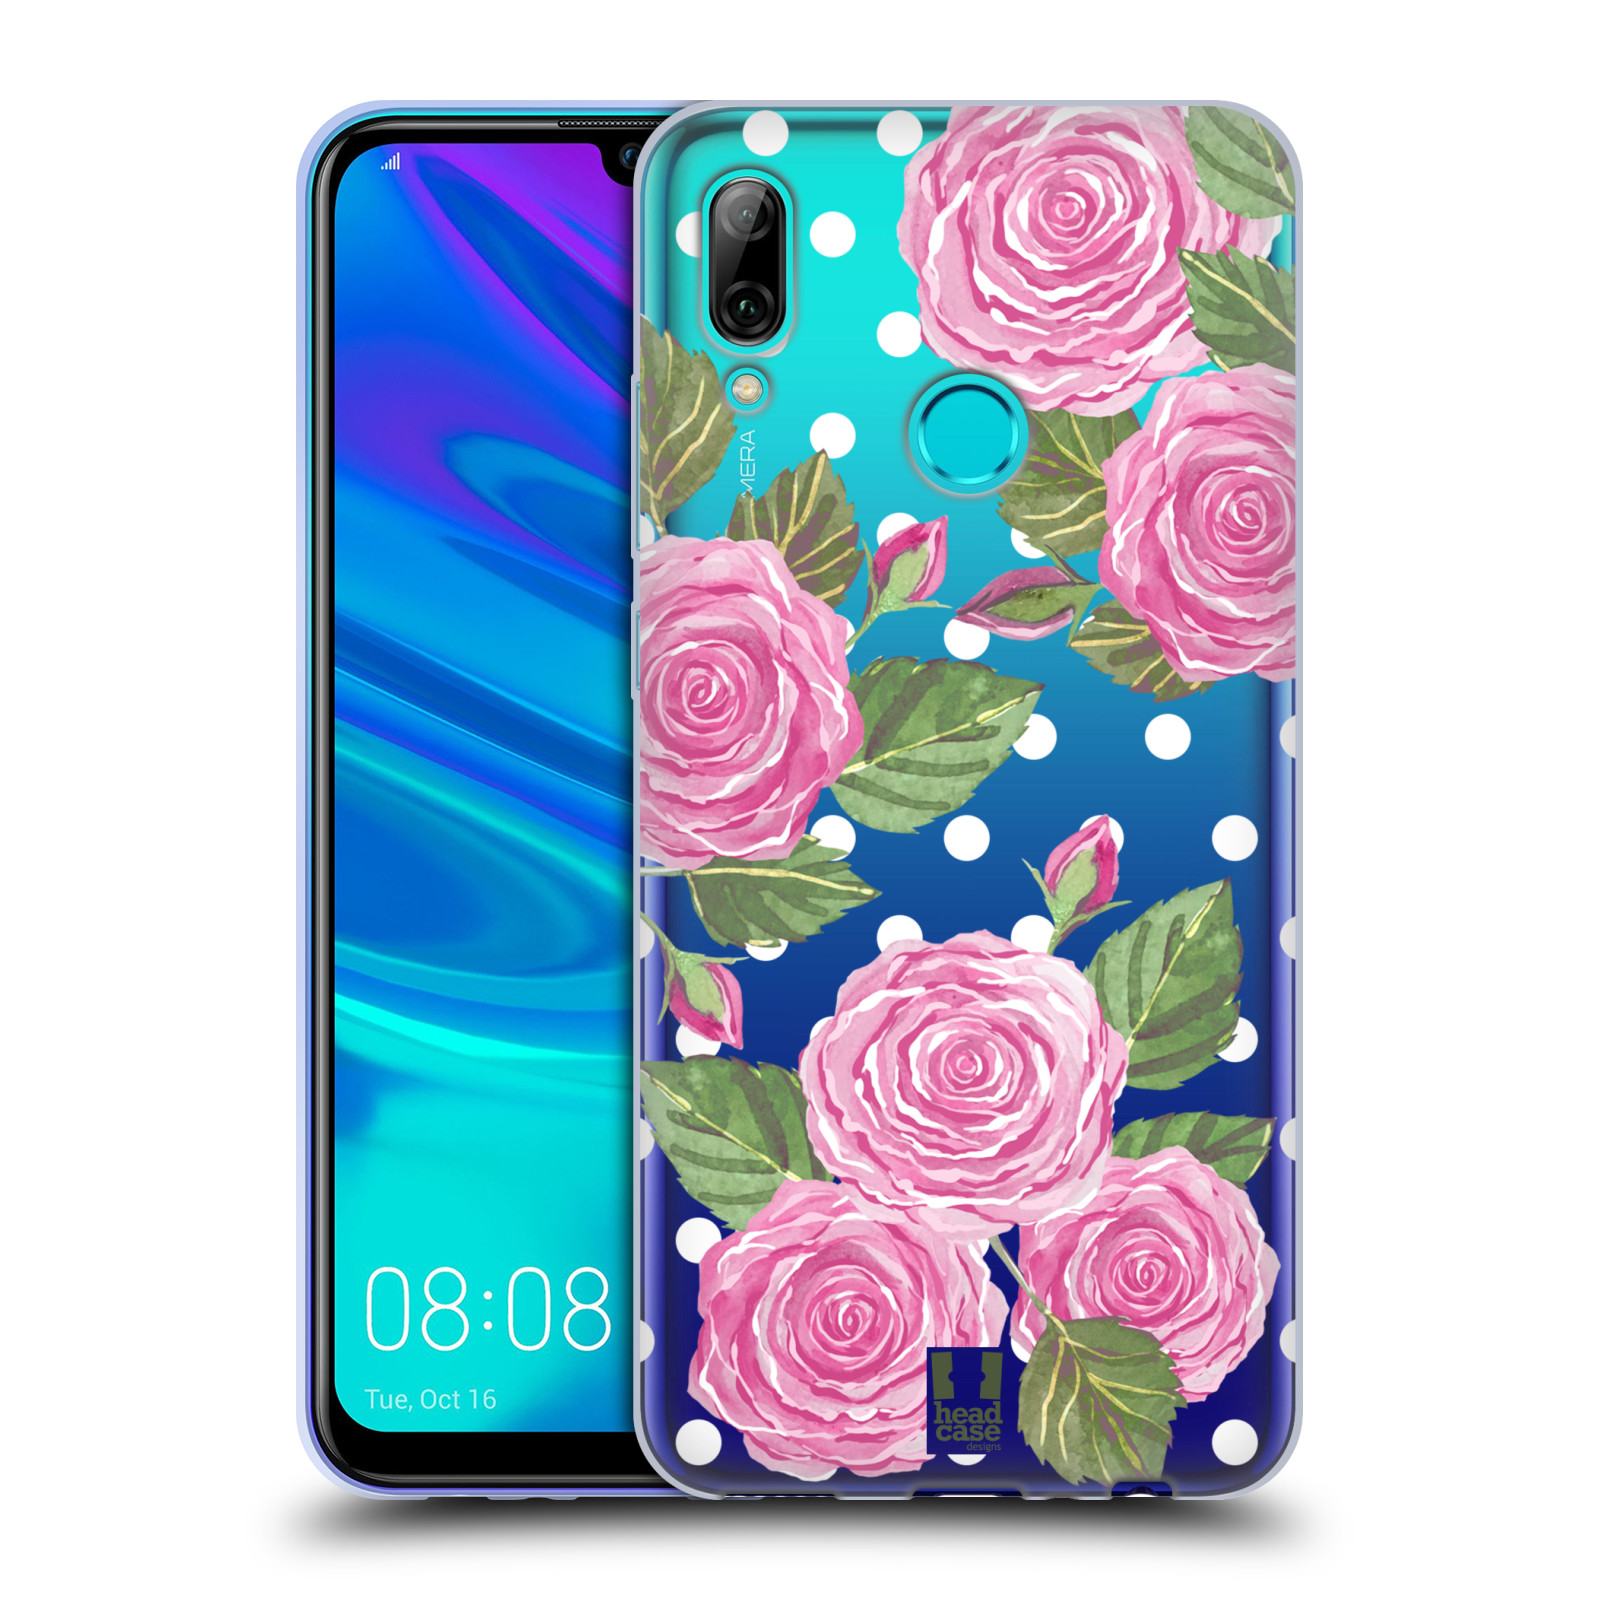 Silikonové pouzdro na mobil Huawei P Smart (2019) - Head Case - Hezoučké růžičky - průhledné